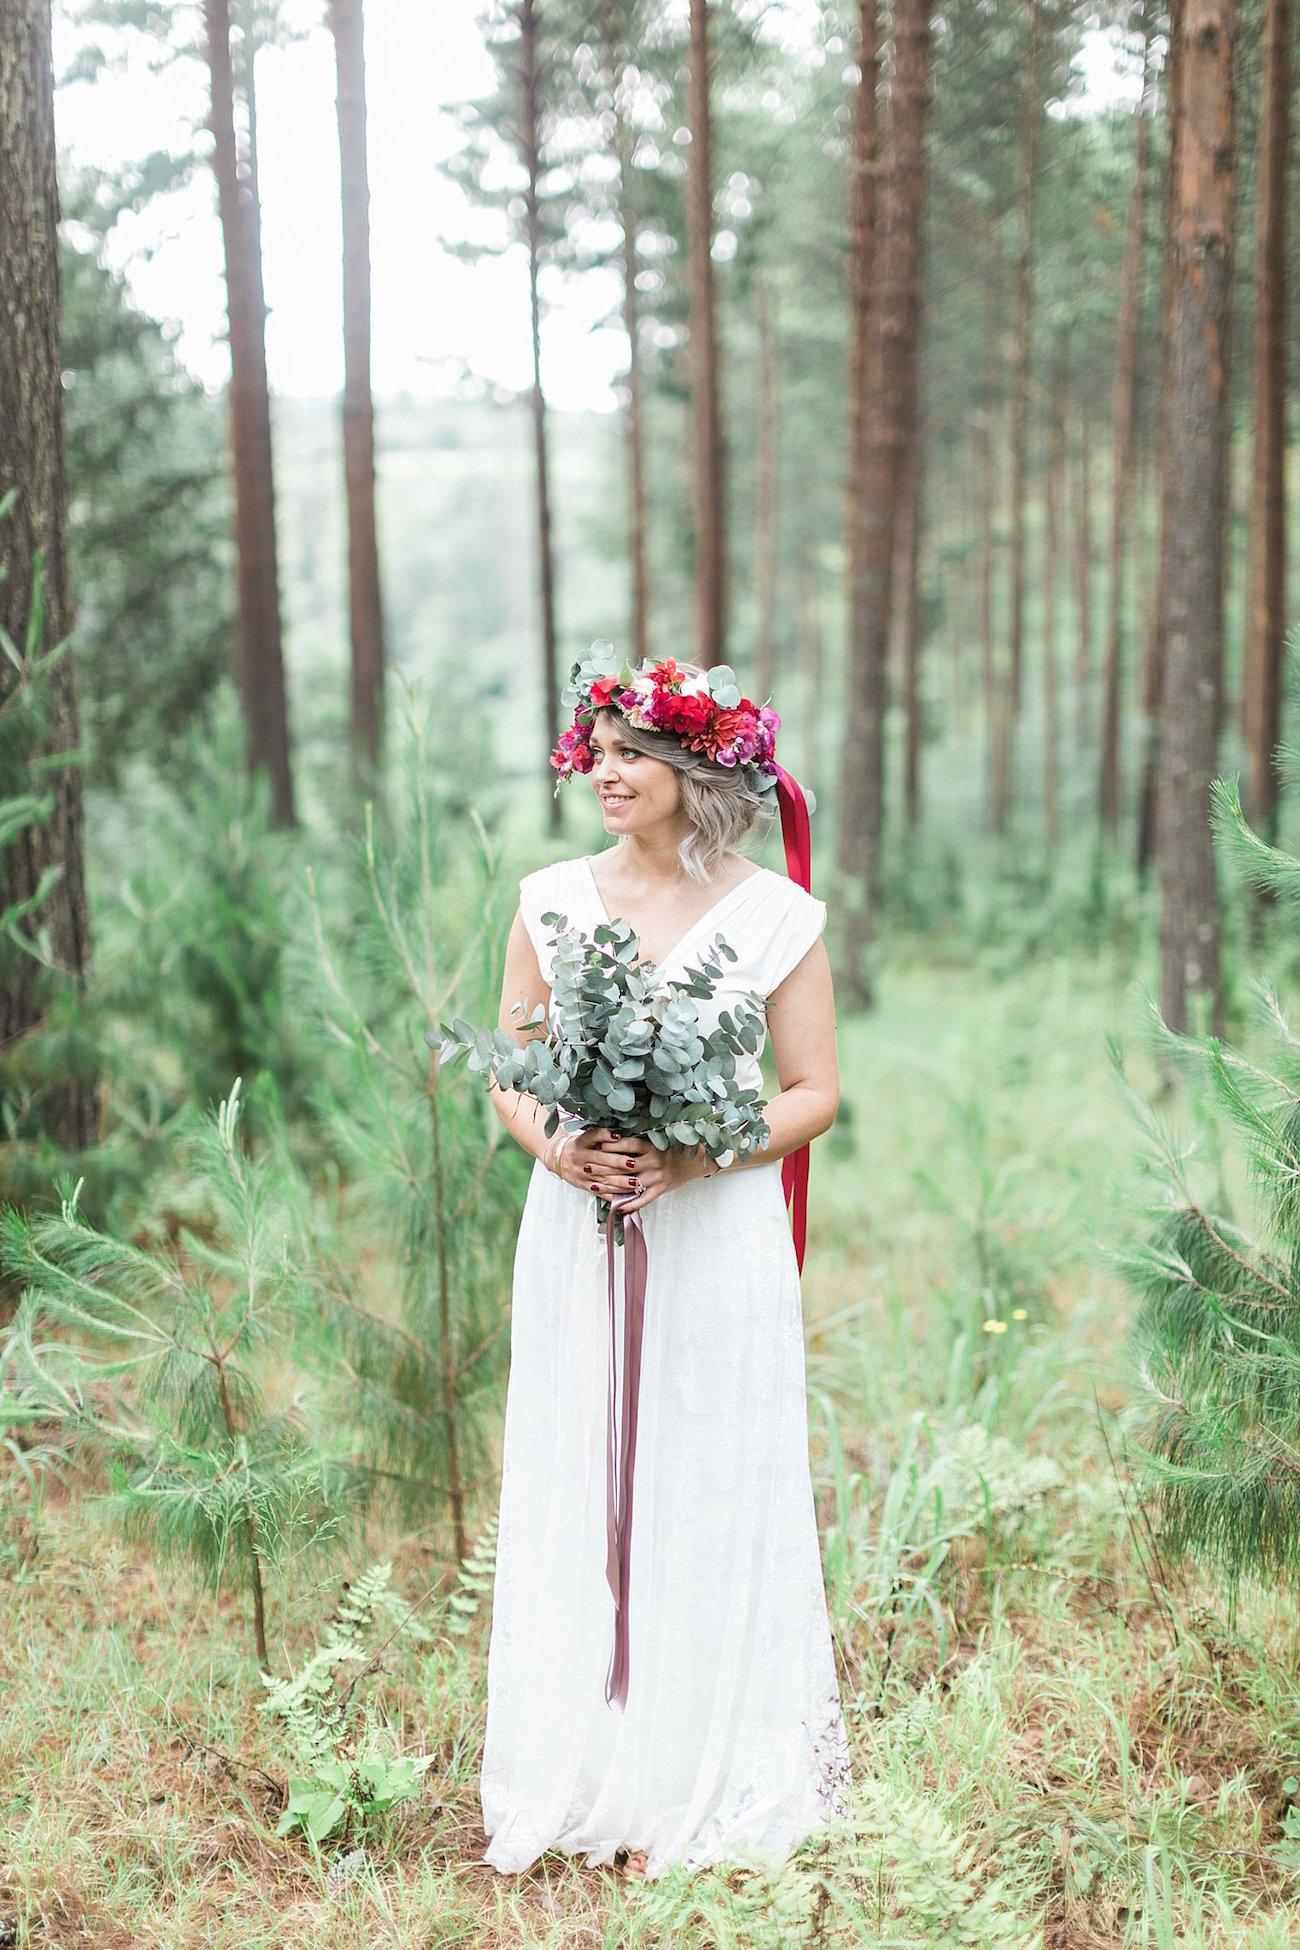 2a61a3df1 Informal Forest Feast Wedding by Alicia Landman | SouthBound Bride